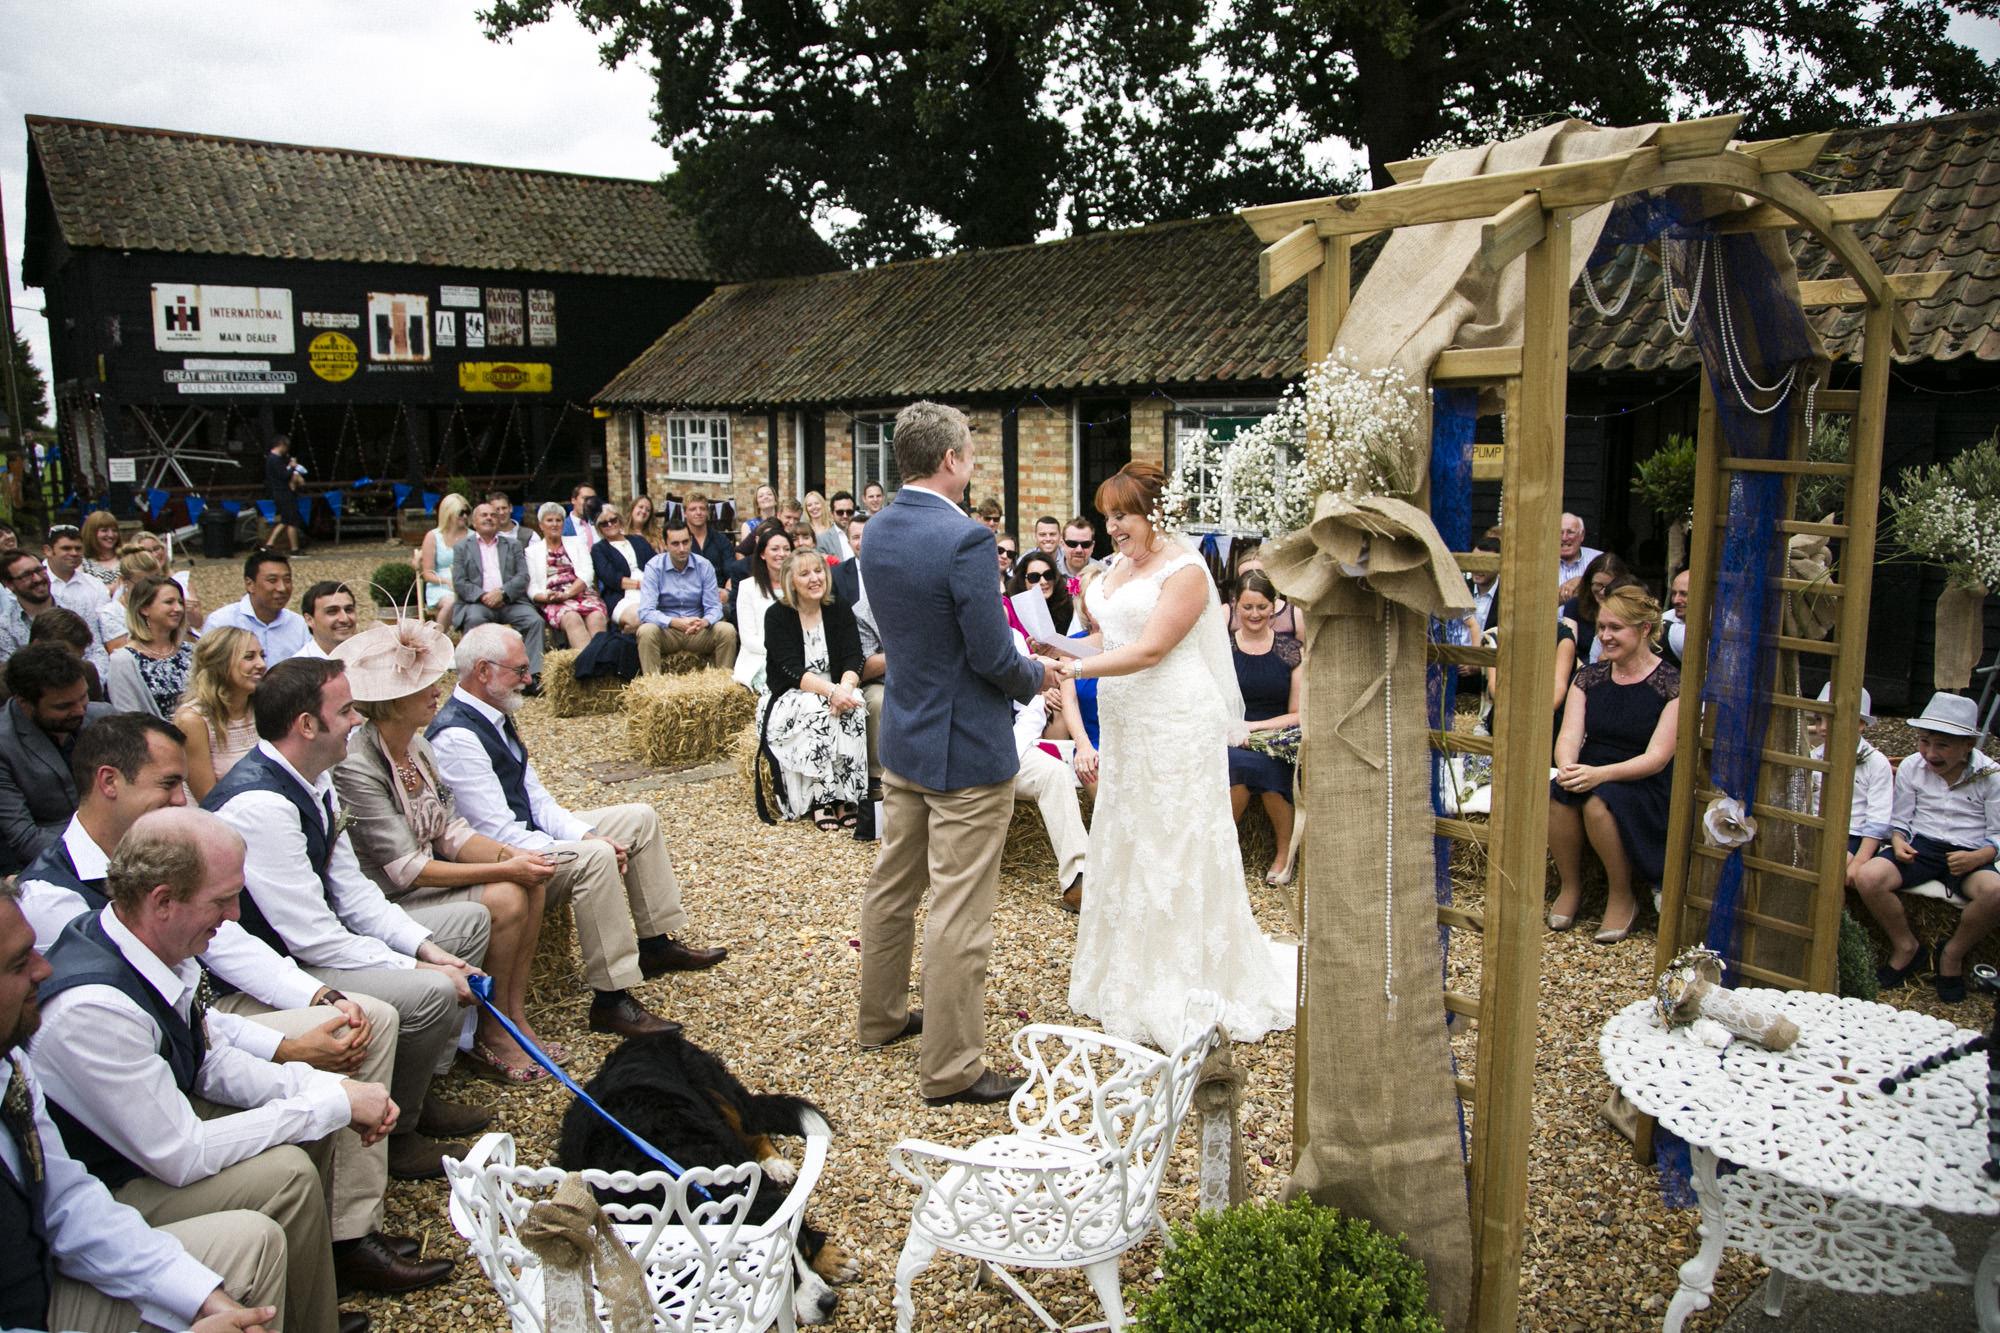 cambridge-wedding-photographer-io-1698-188.jpg